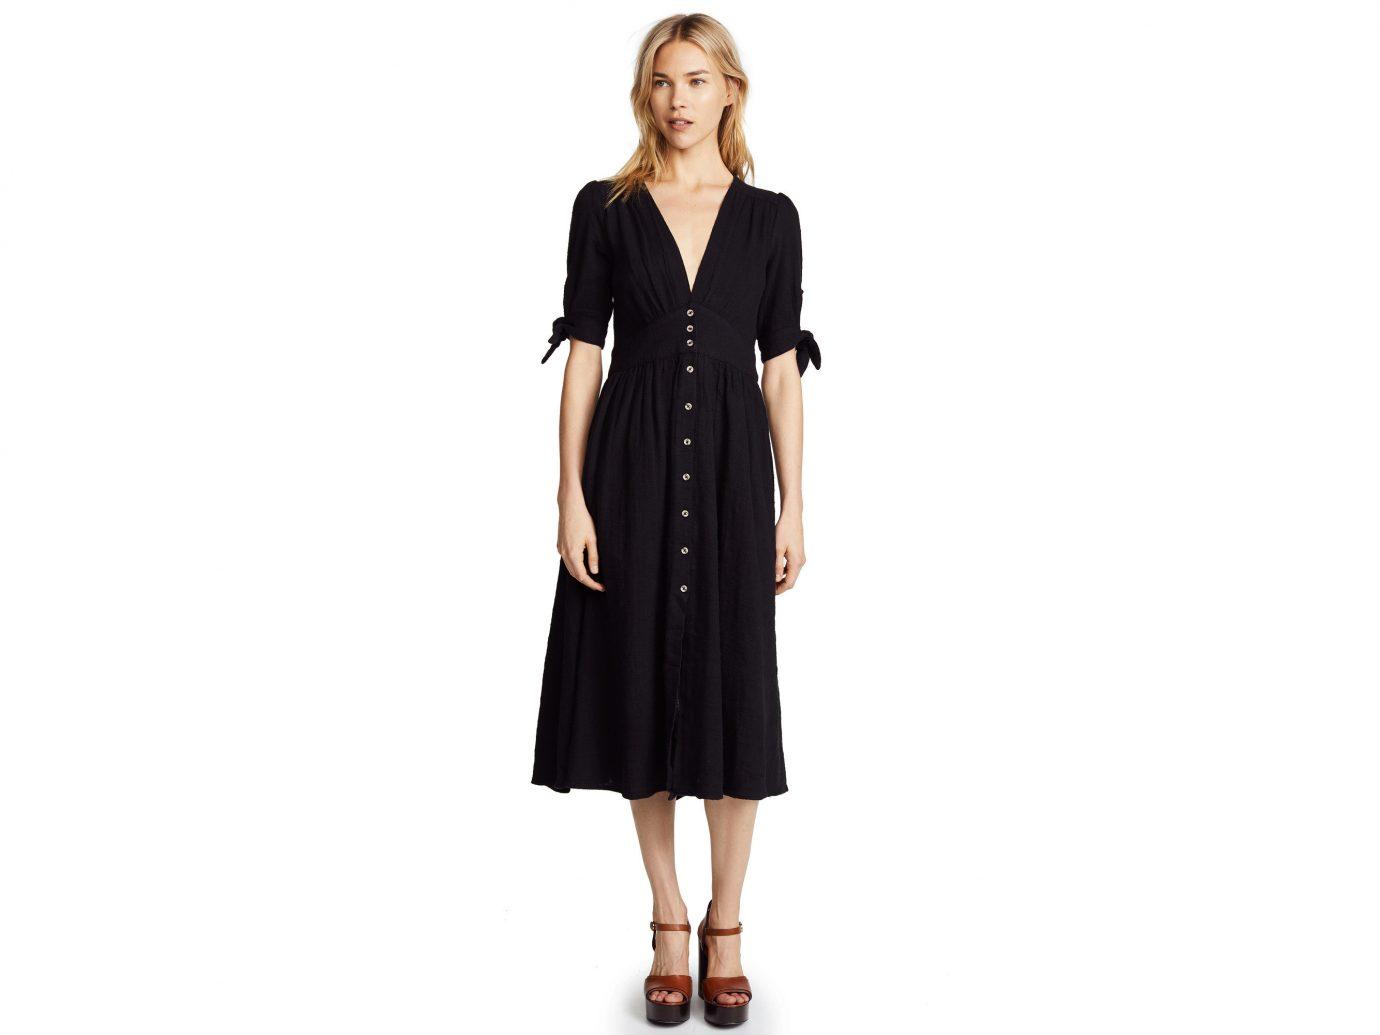 Style + Design Travel Shop clothing dress day dress fashion model little black dress sleeve formal wear costume neck